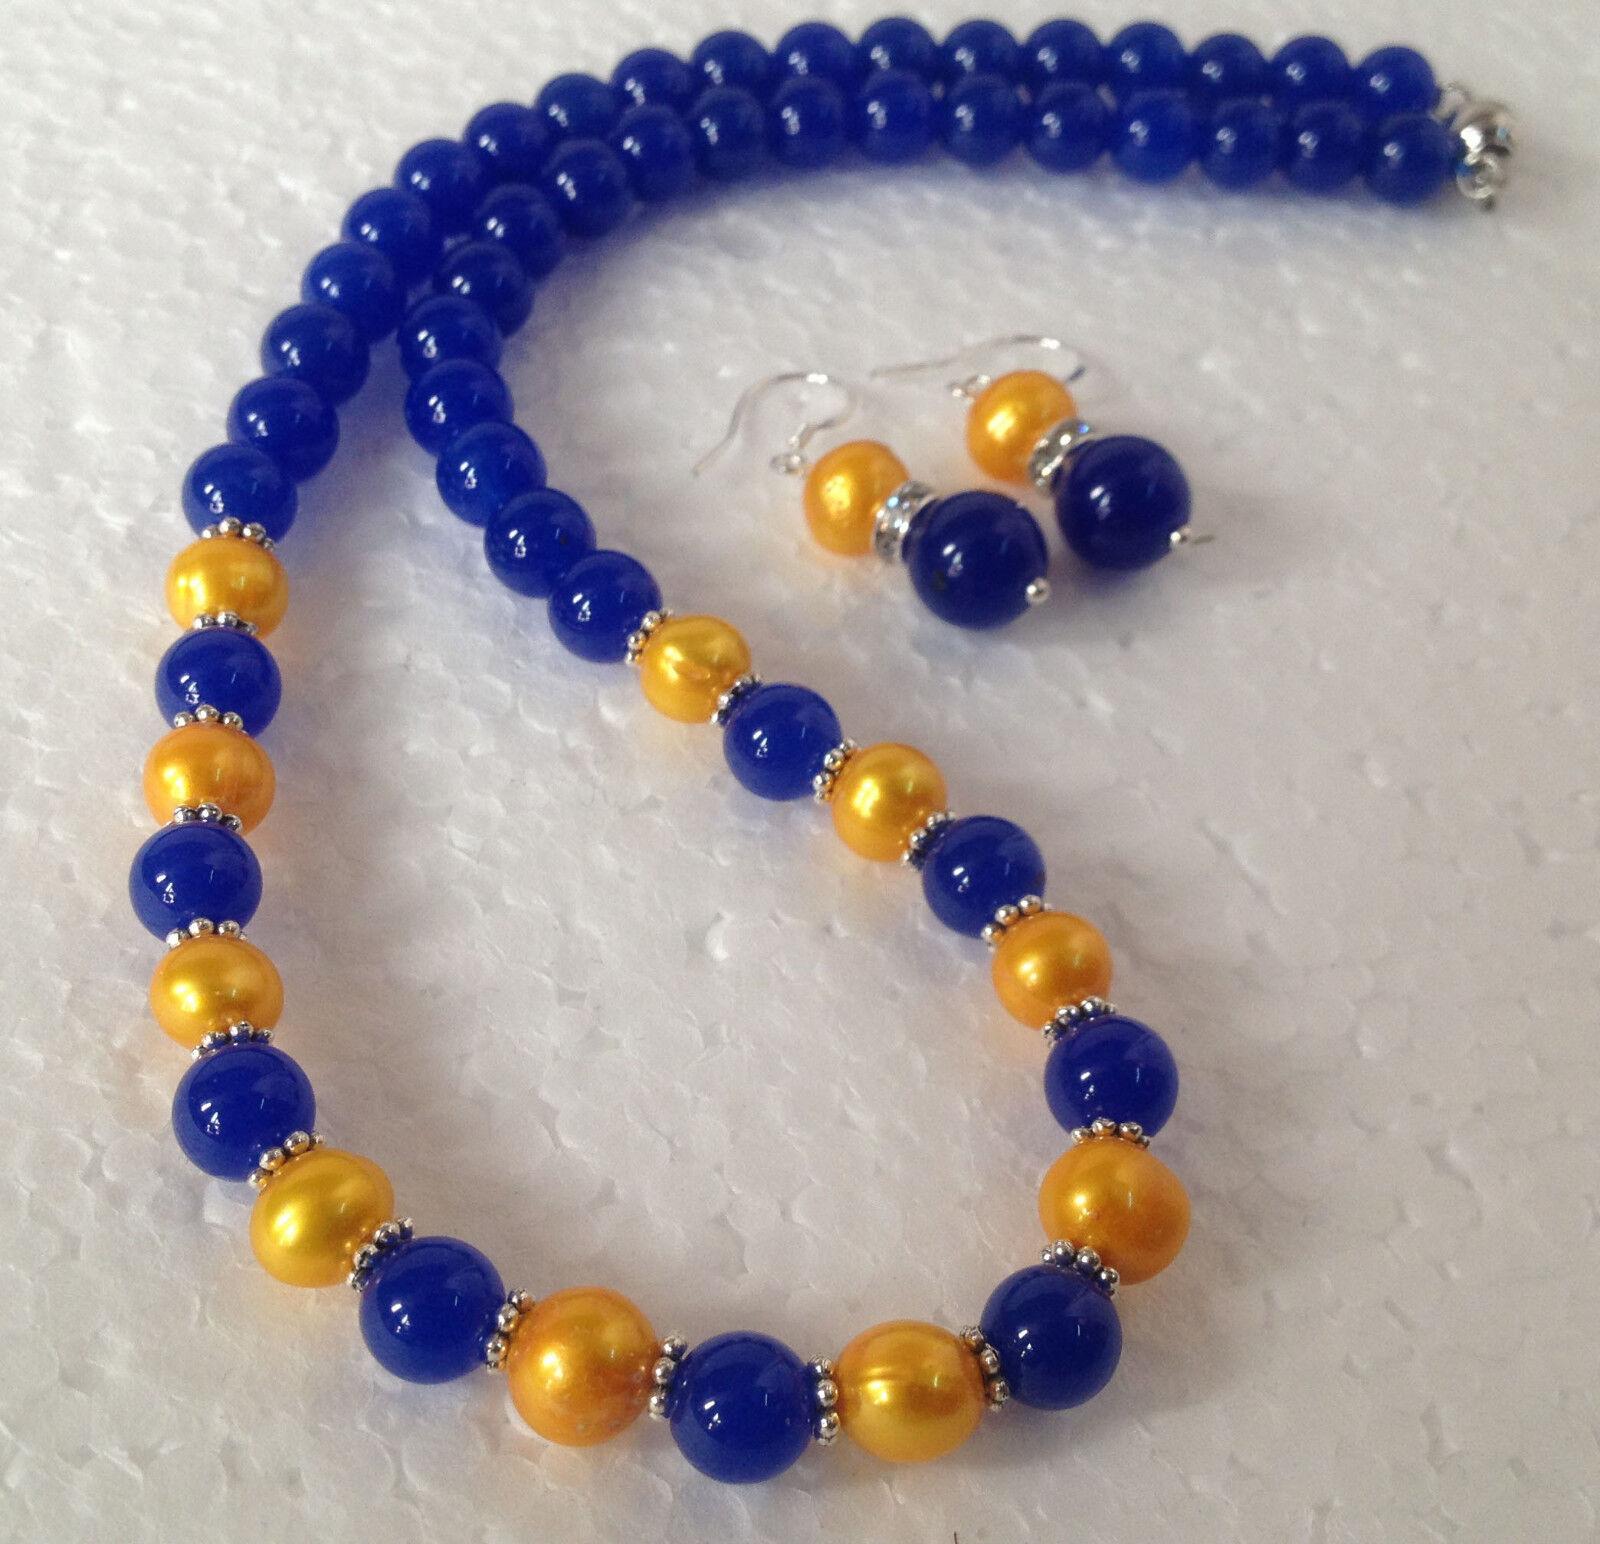 Genuine Jade Beads: Genuine Golden Akoya Cultured Pearl/Blue Jade Beads